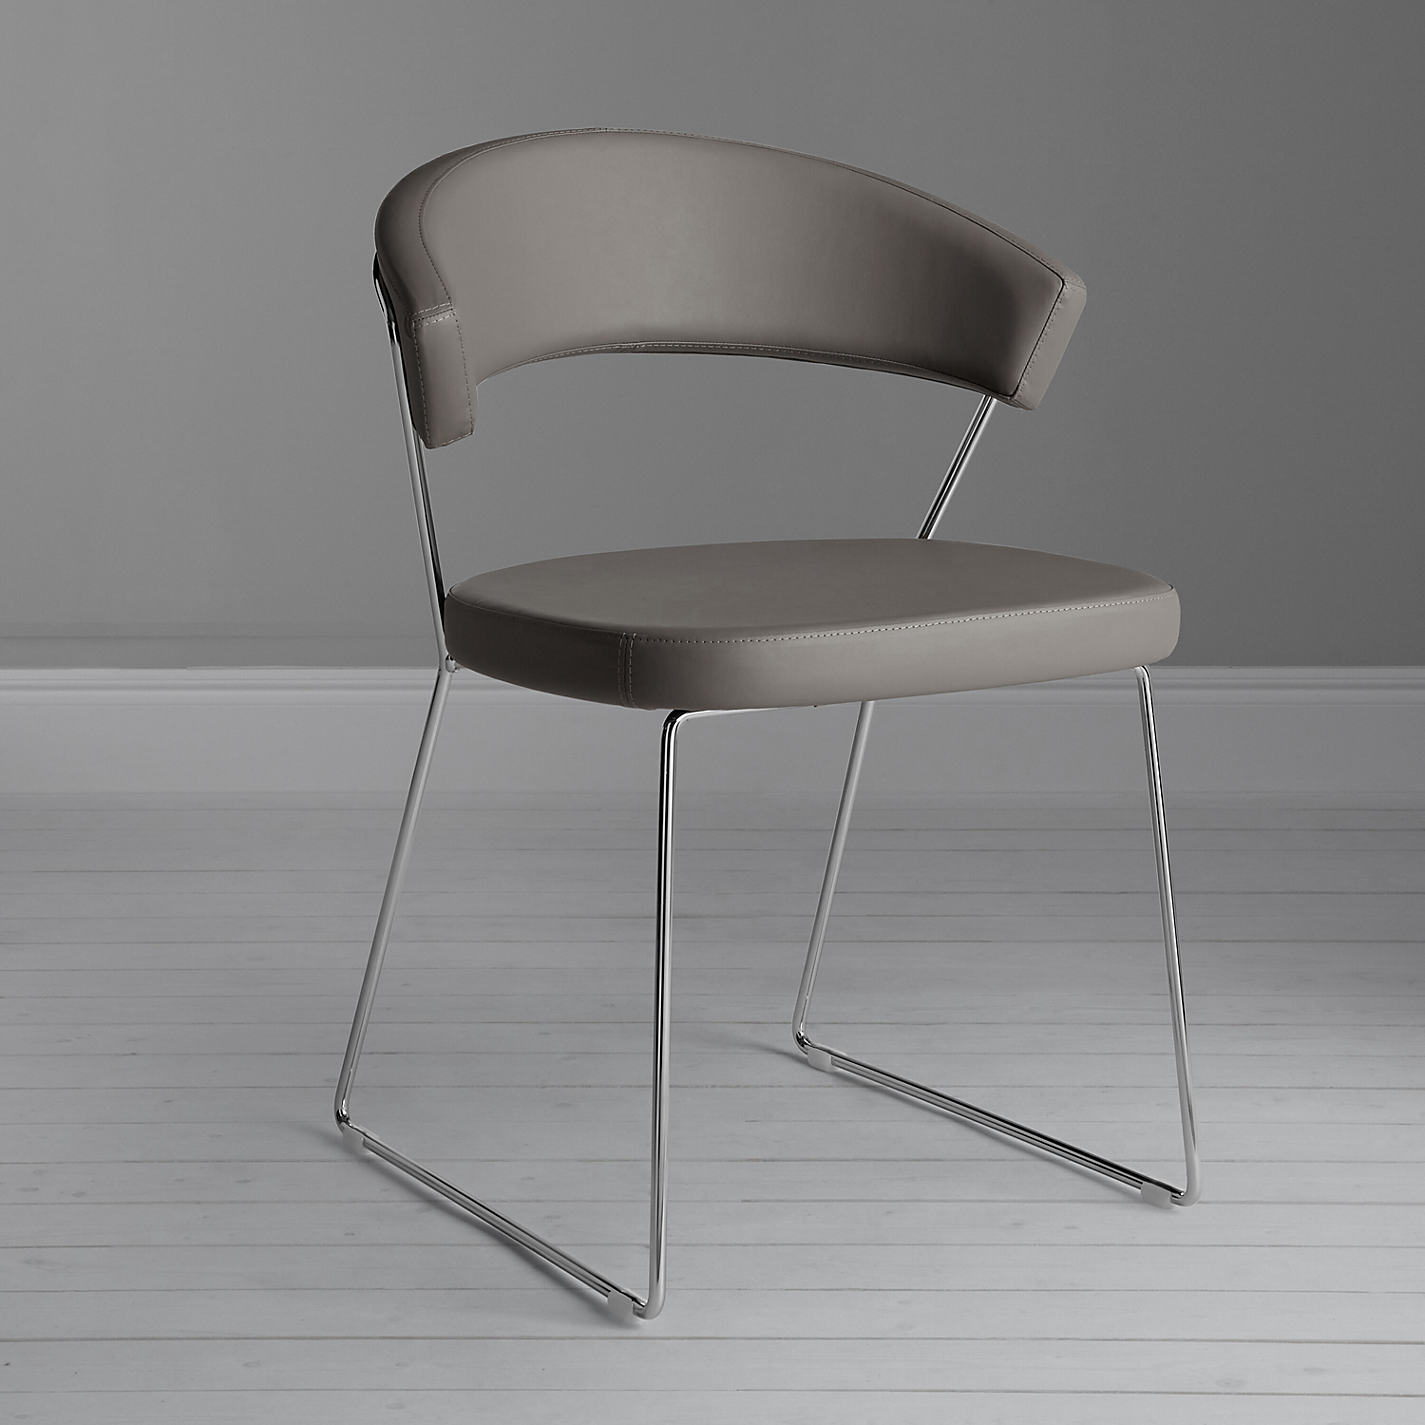 Buy Calligaris New York Dining Chair | John Lewis